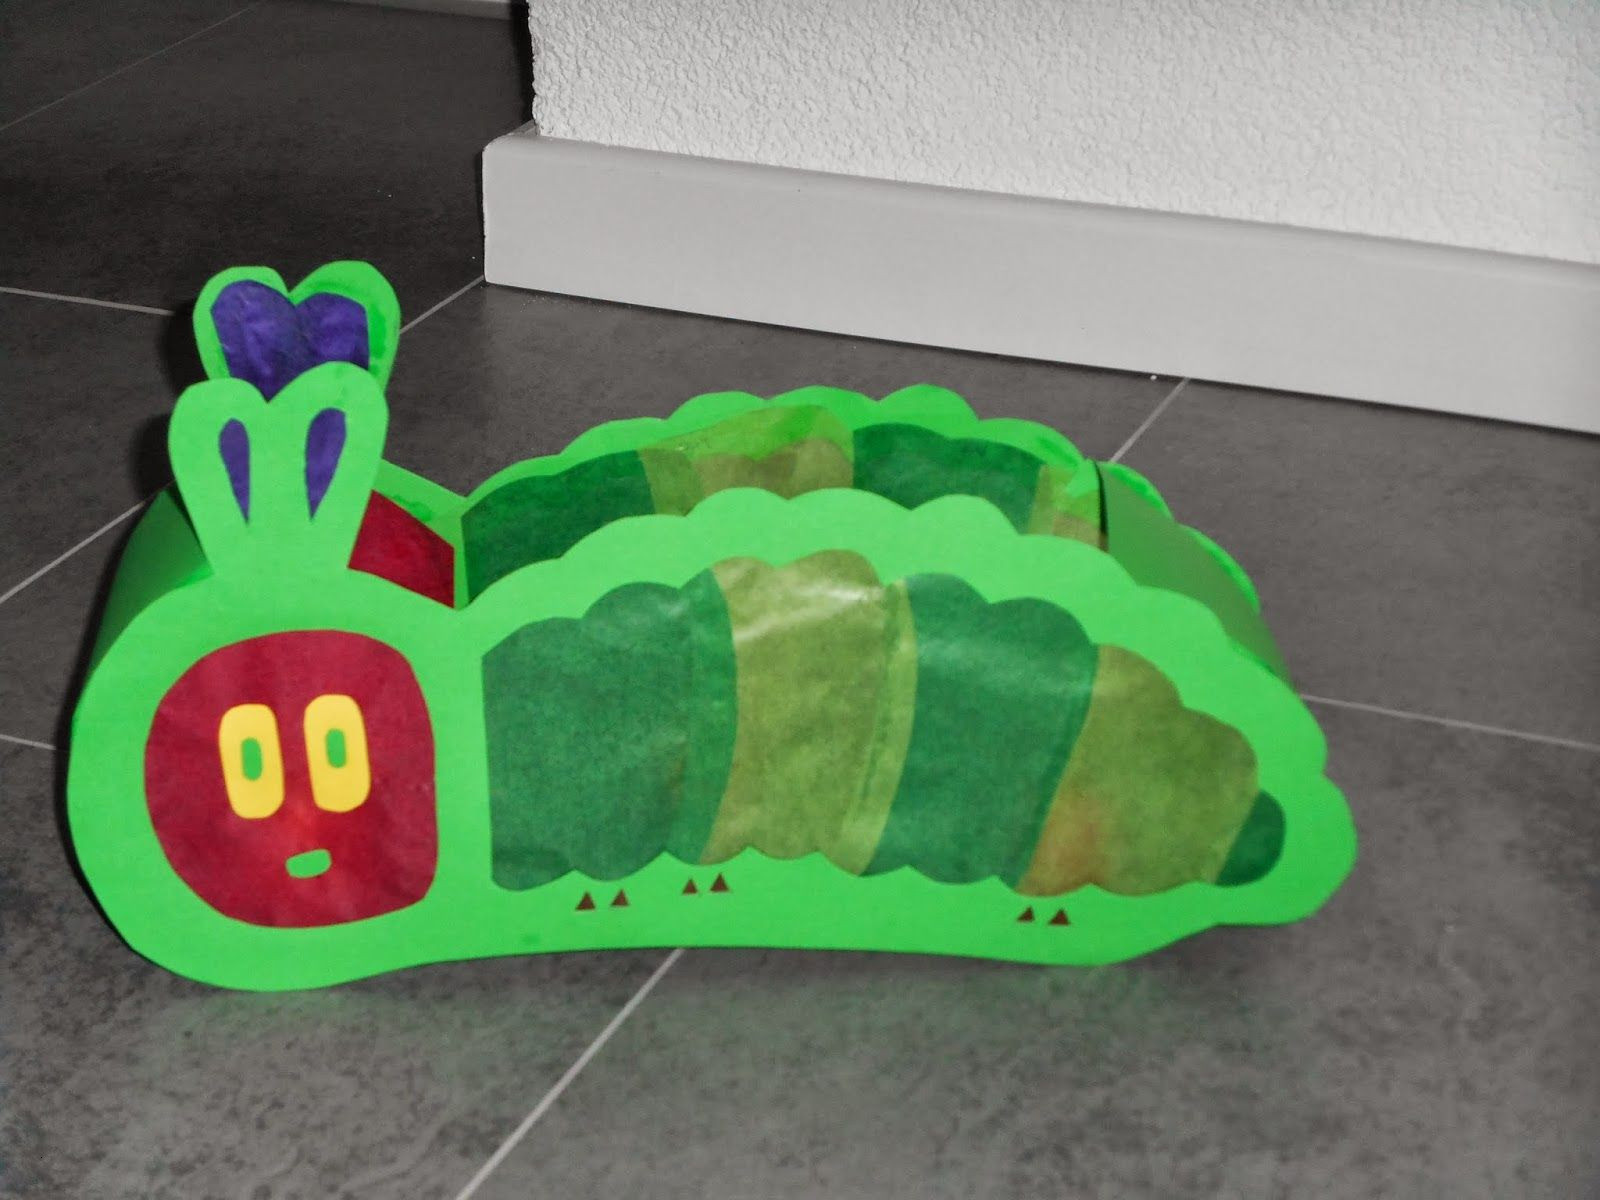 Ausmalbilder Raupe Nimmersatt Genial Dscn0117 Jpg 1 600—1 200 Pixel Laternen Pinterest Luxus Raupe Galerie